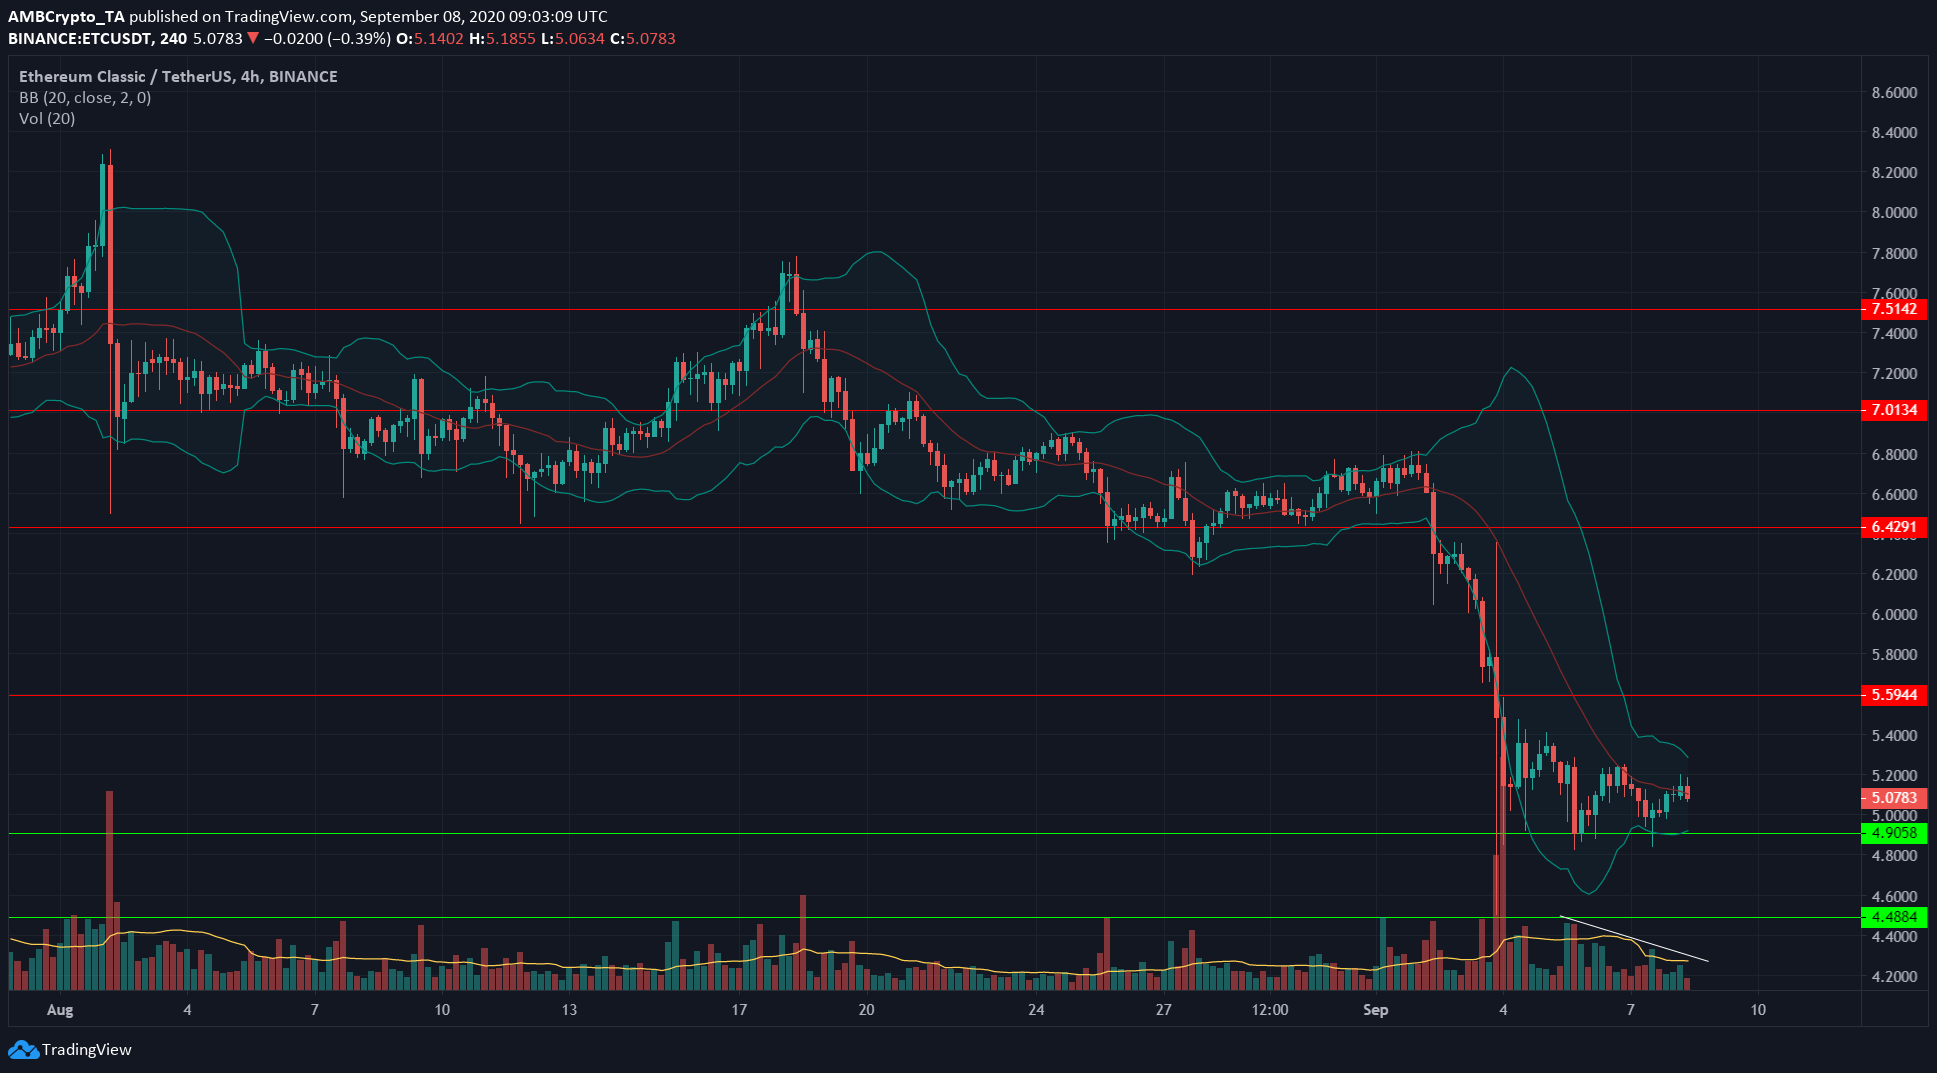 Bitcoin SV, Cosmos, Ethereum Classic Price Analysis: 08 September